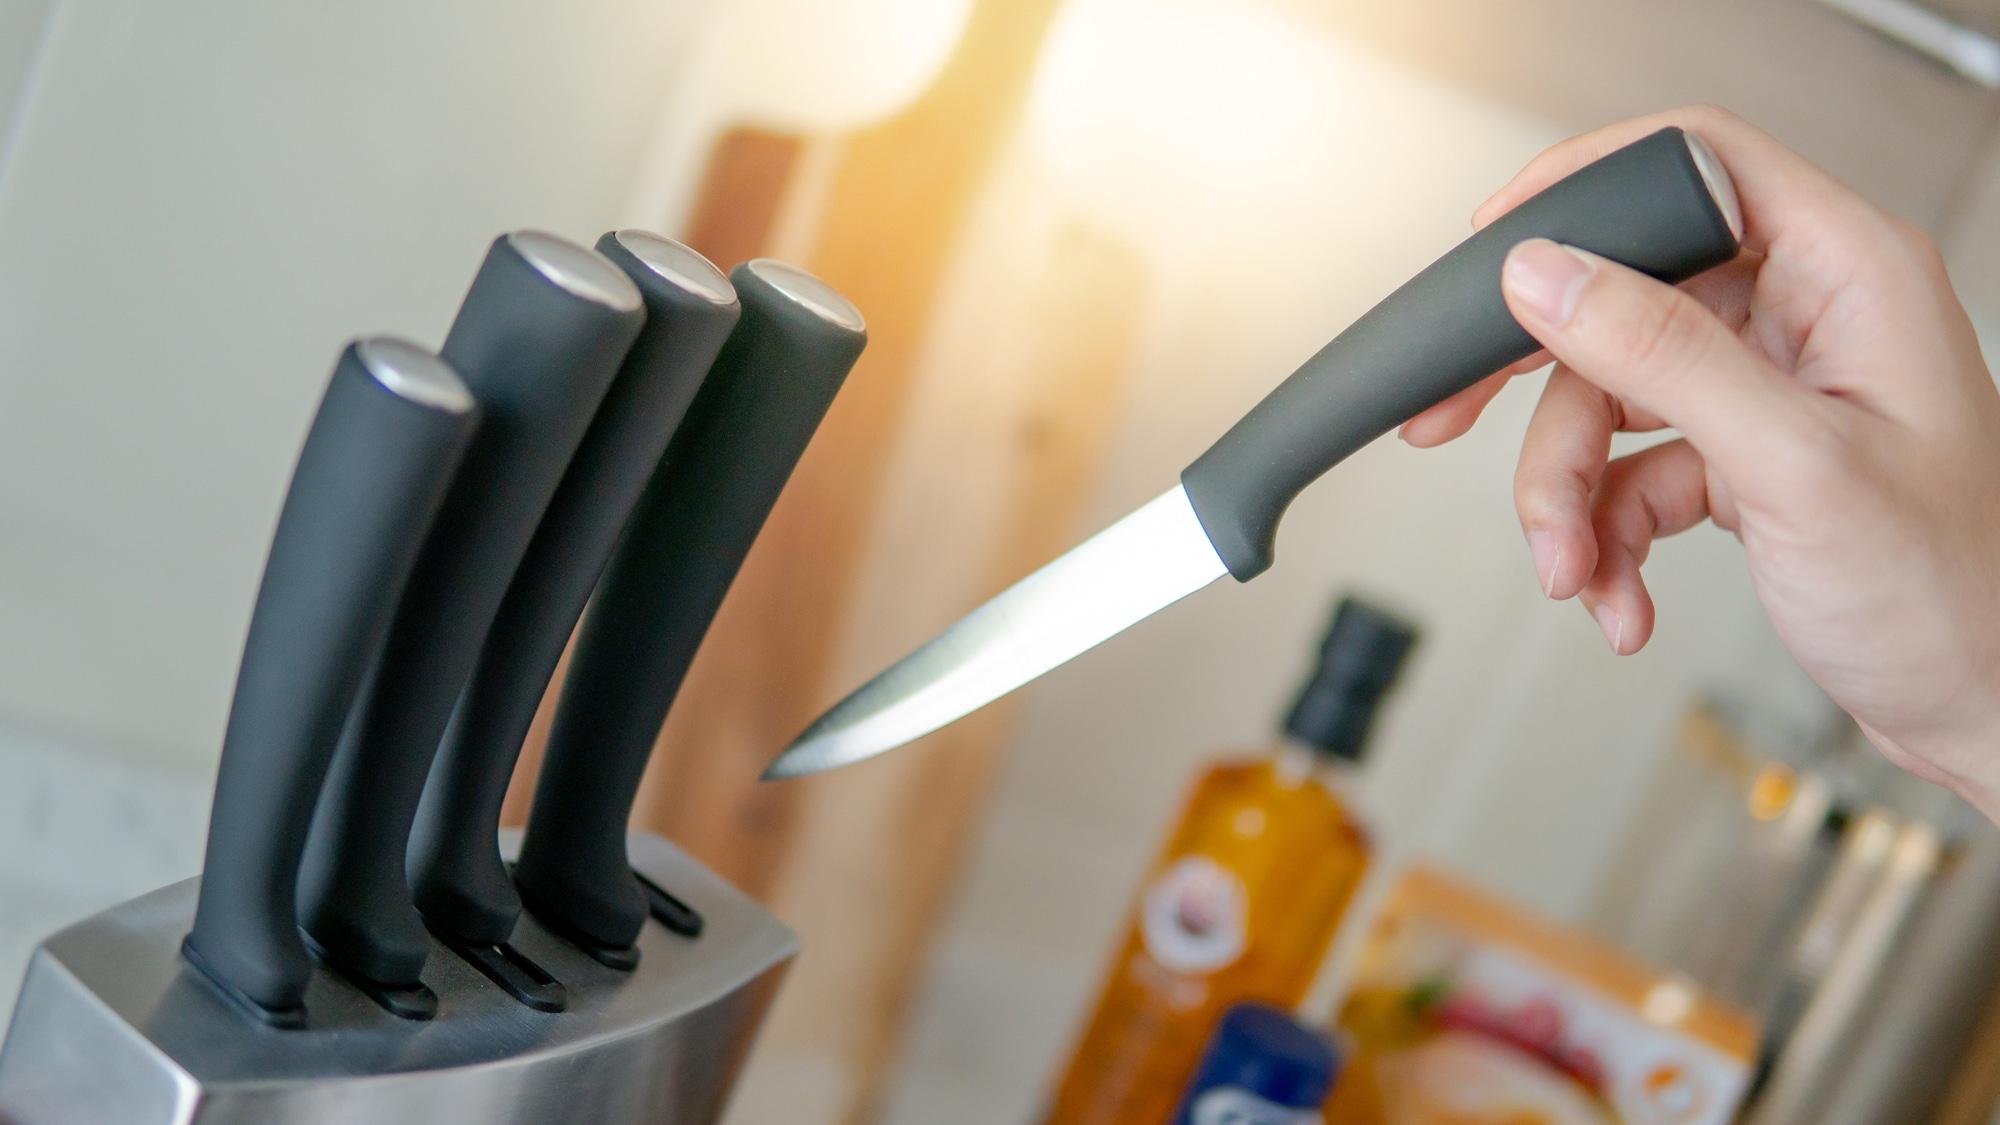 Best Kitchen Knife Reviews Uk 2021 Top 10 Comparison